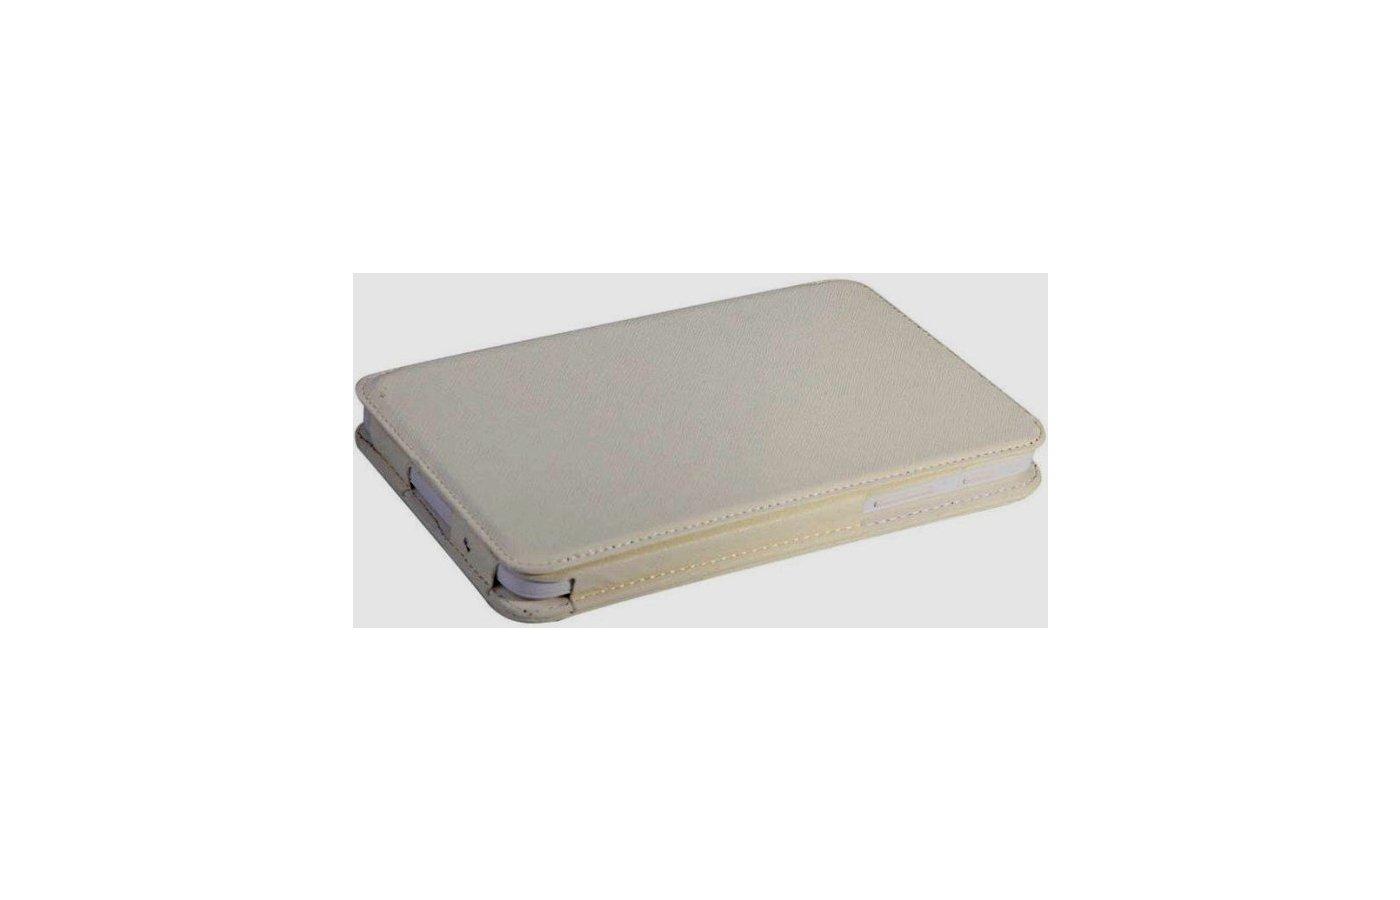 Чехол для планшетного ПК IT BAGGAGE для SAMSUNG Galaxy Tab3 Lite 7.0 SM-T110/111 искус.кожа белый ITSSGT73L03-0